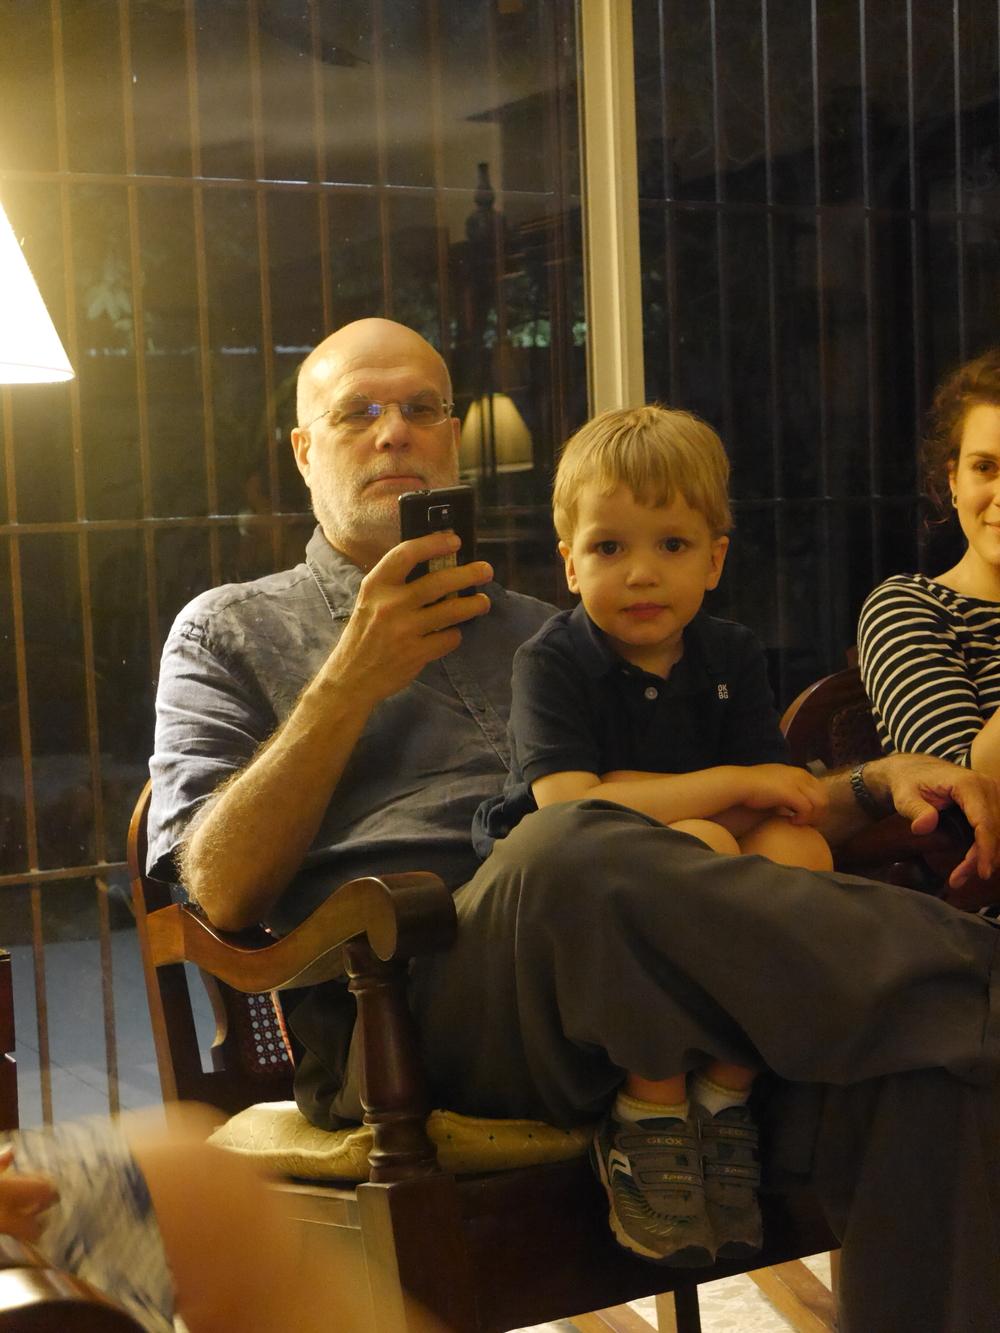 Sebastian looking angelic. Dad looking distracted.